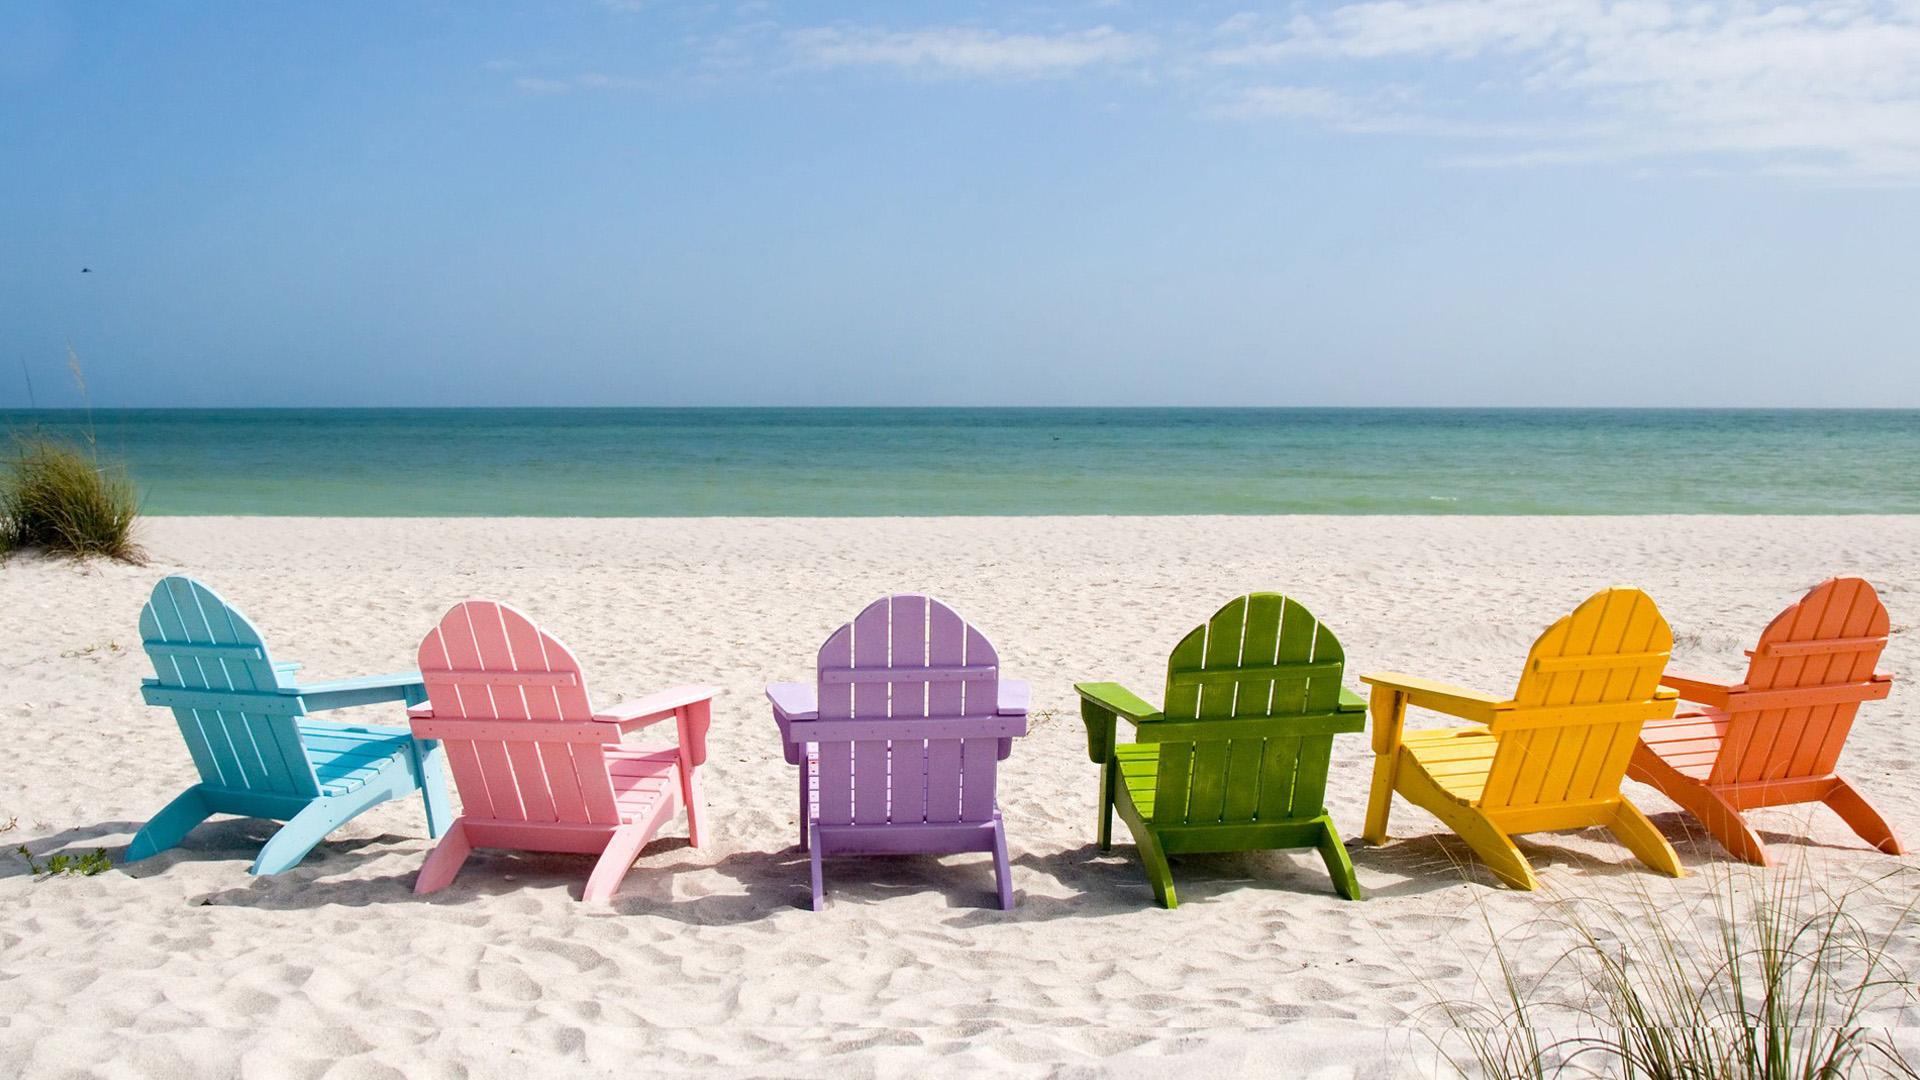 Adirondack Chairs On Beach Wallpapers Wallpapersafari